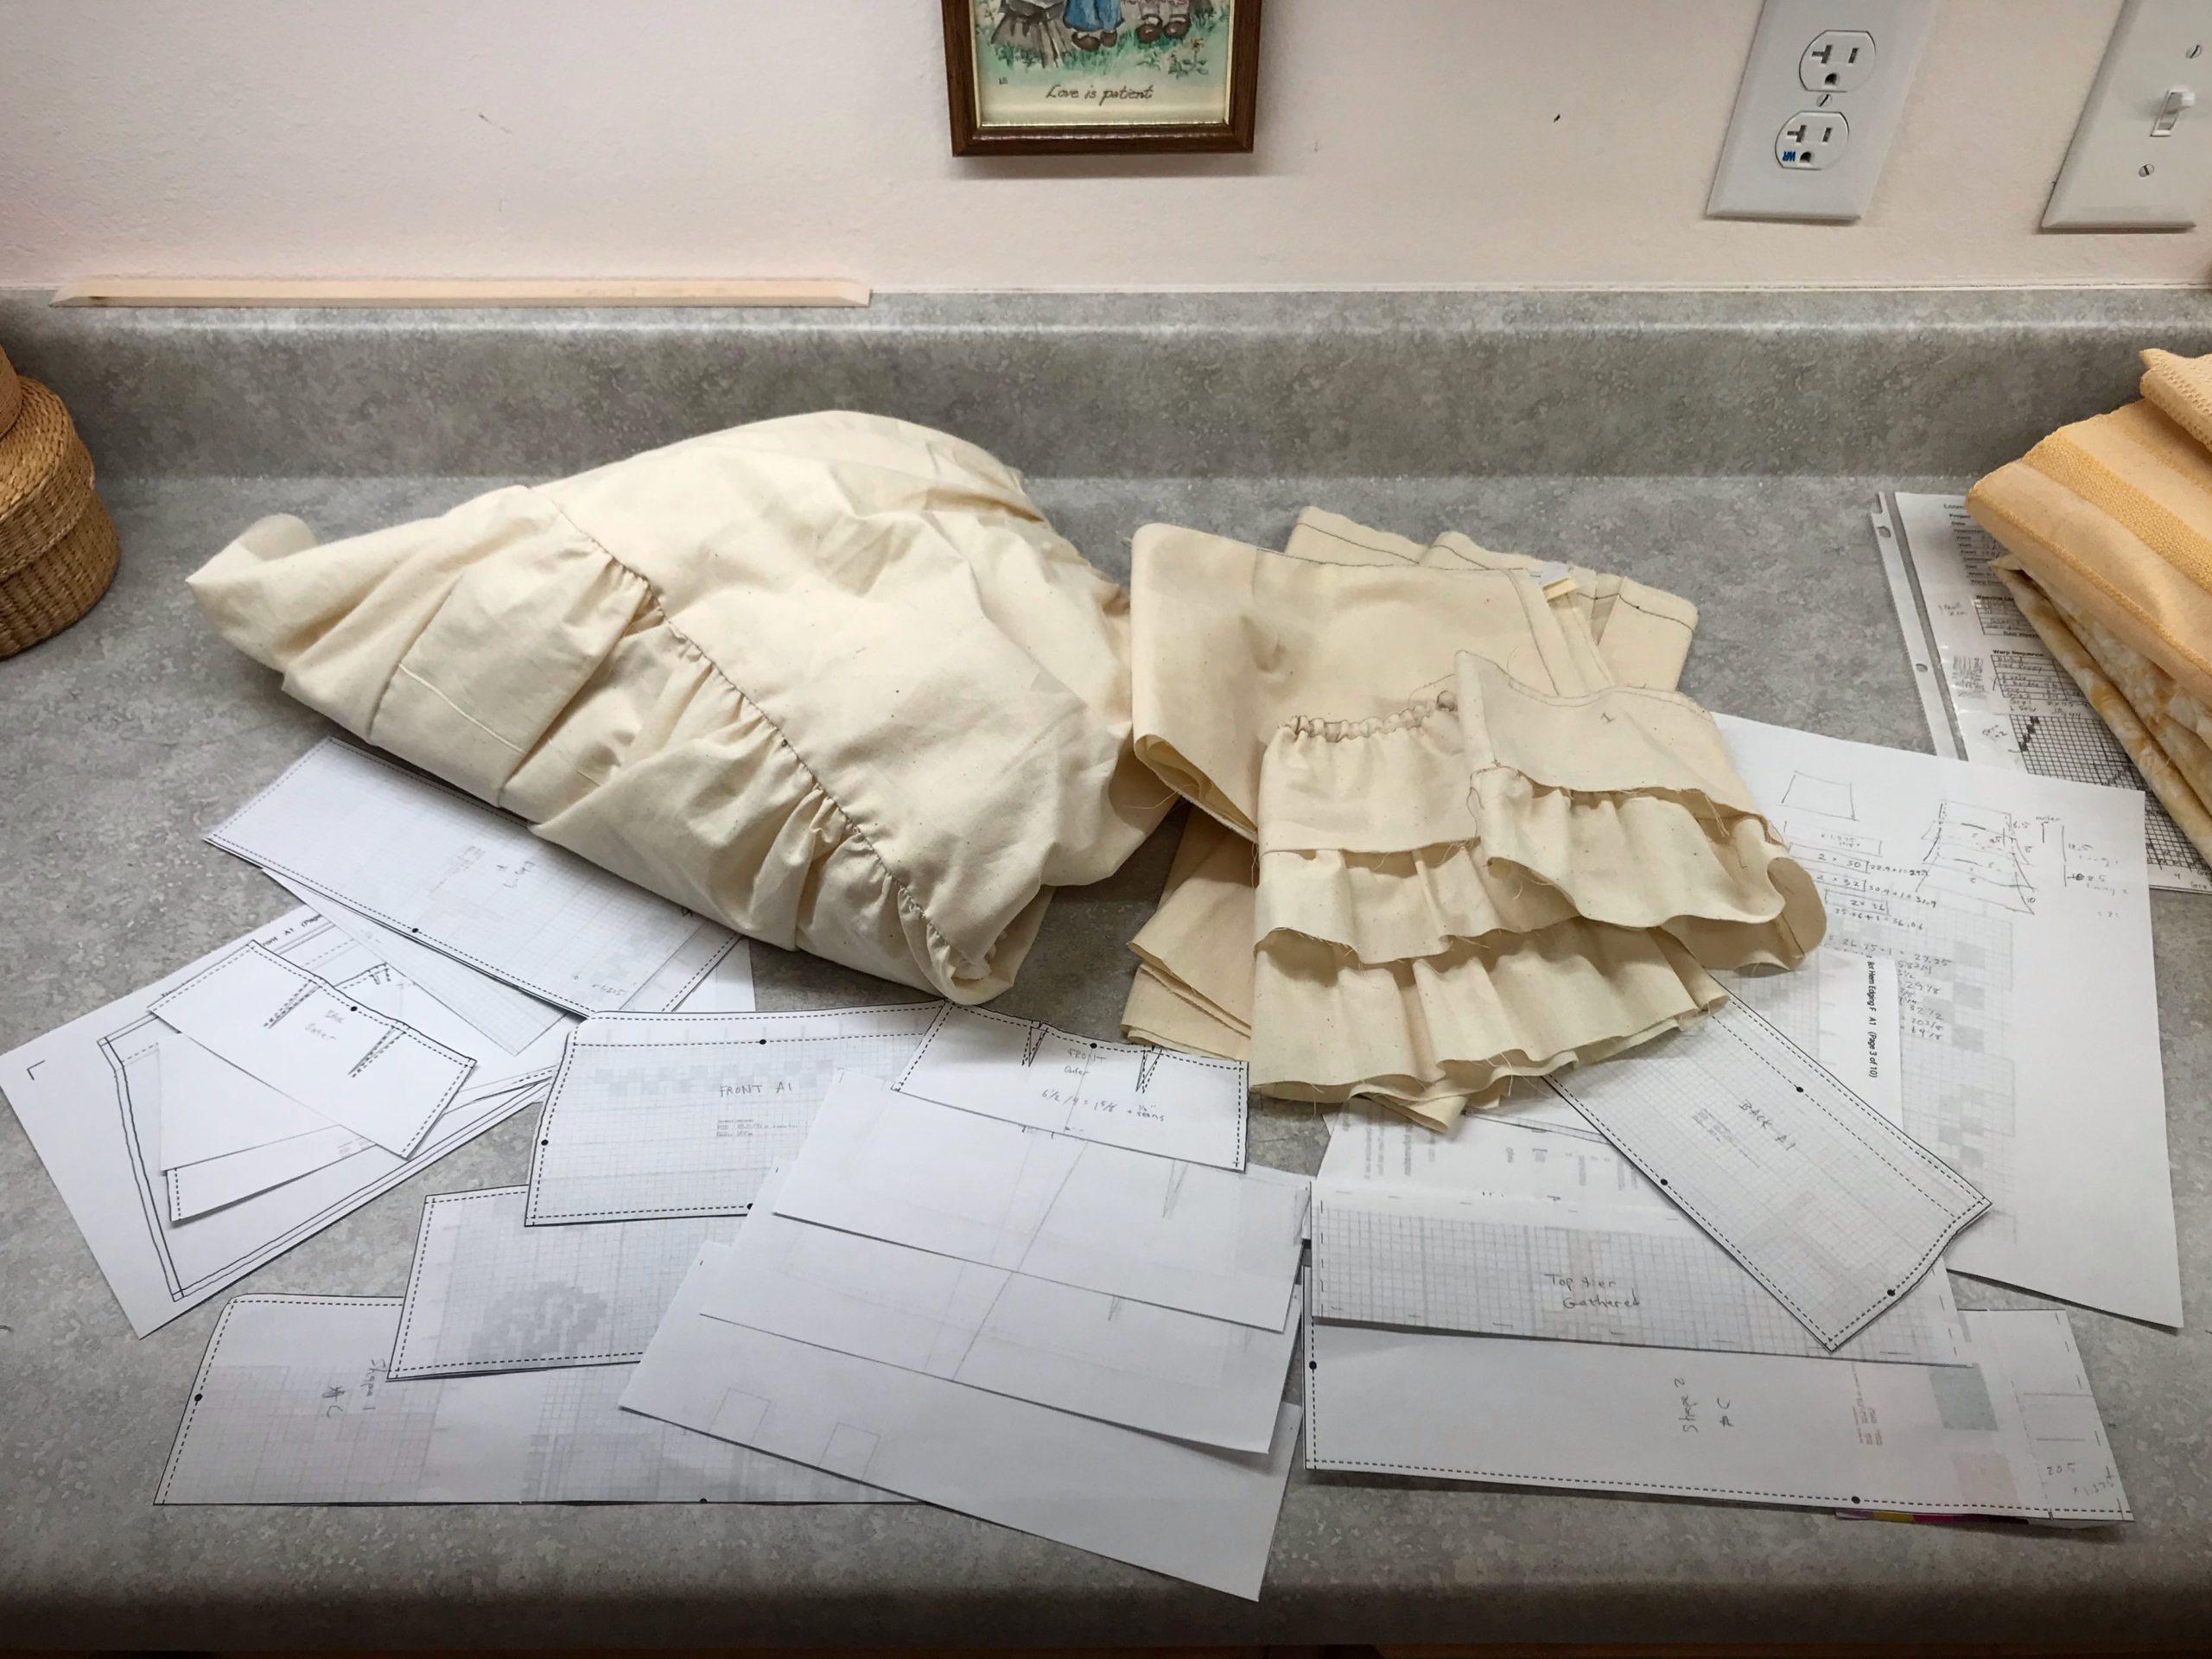 Using Garment Designer to design a layered tiered skirt.